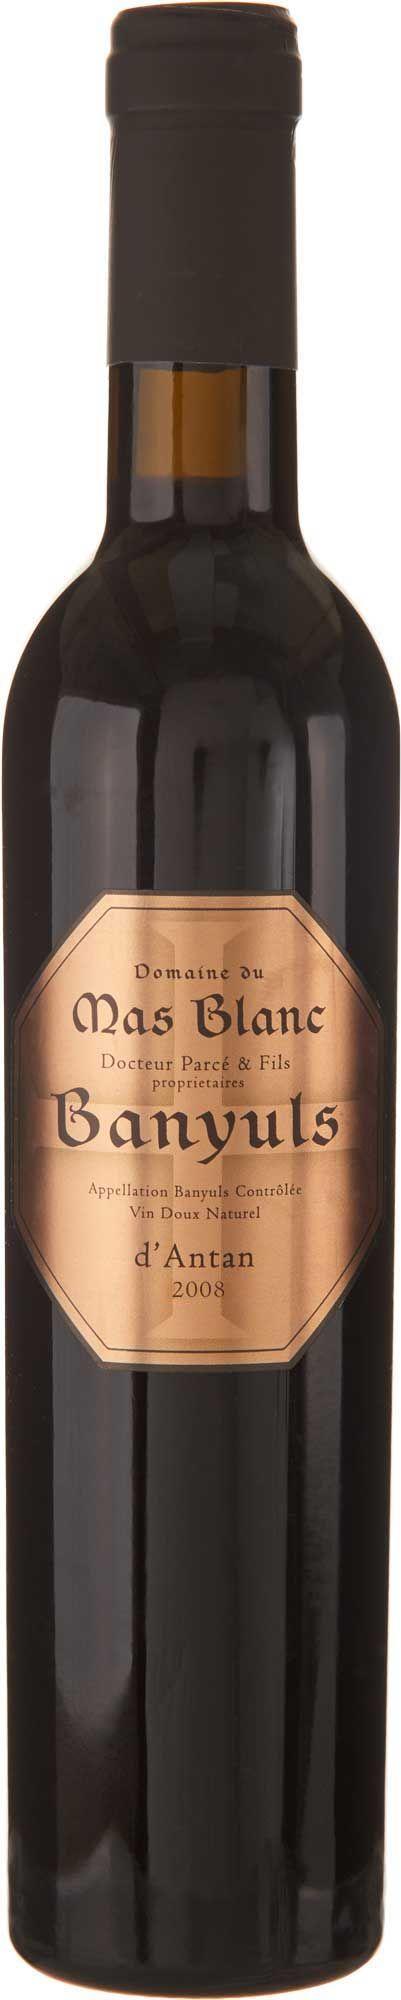 Domaine du Mas Blanc Banyuls D'Antan 2008